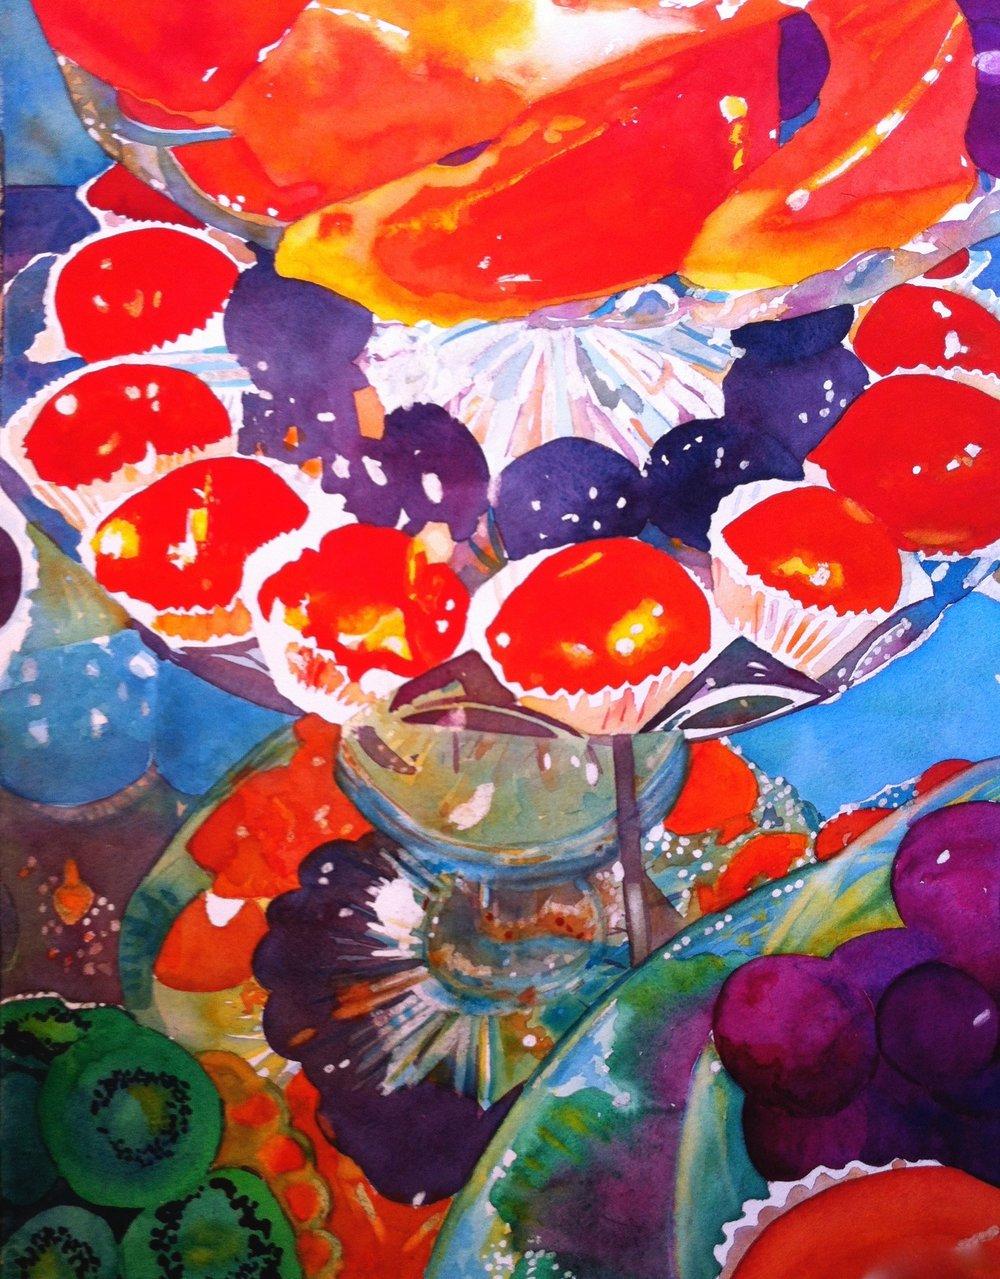 London Sweets 19 x 15 2012.jpg